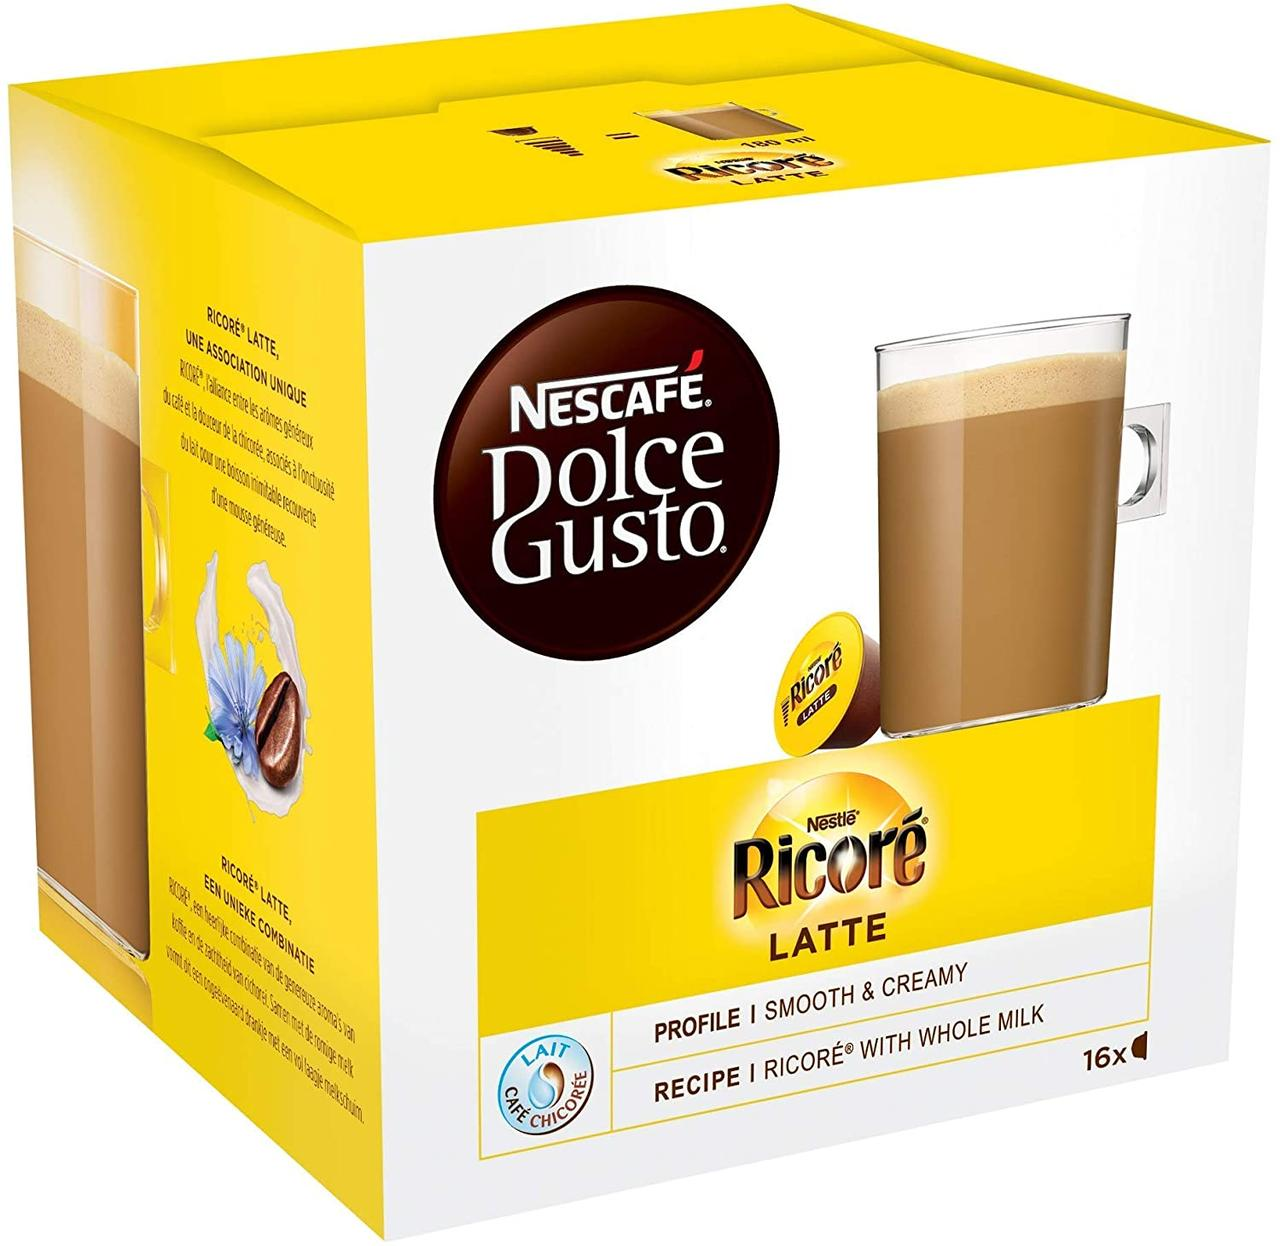 Dolce Gusto Ricore Latte - Кофе в капсулах Дольче Густо 16 порций!!!